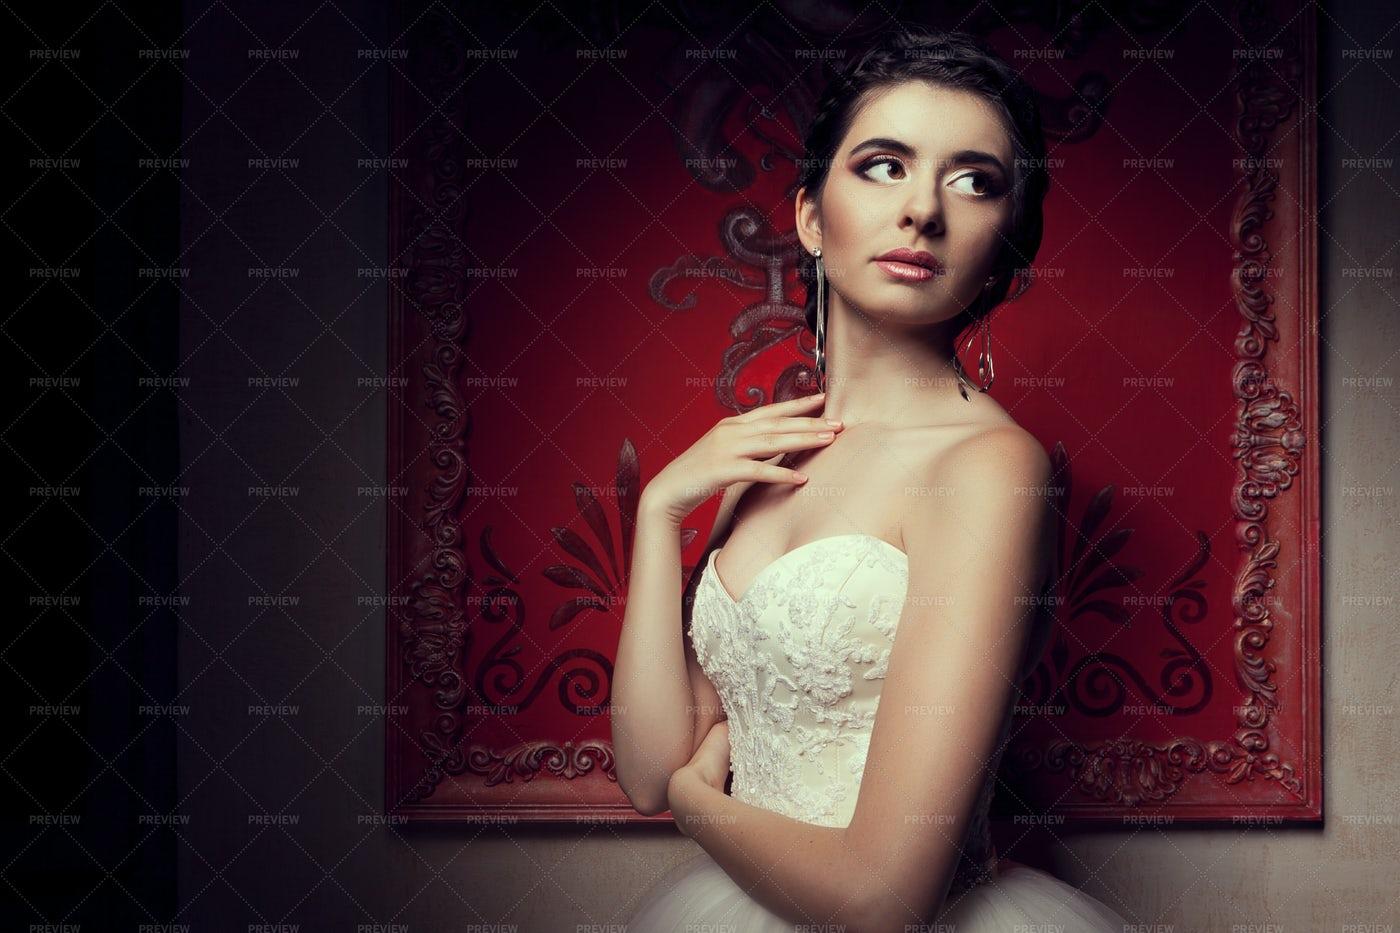 Bride In Strapless Wedding Dress: Stock Photos